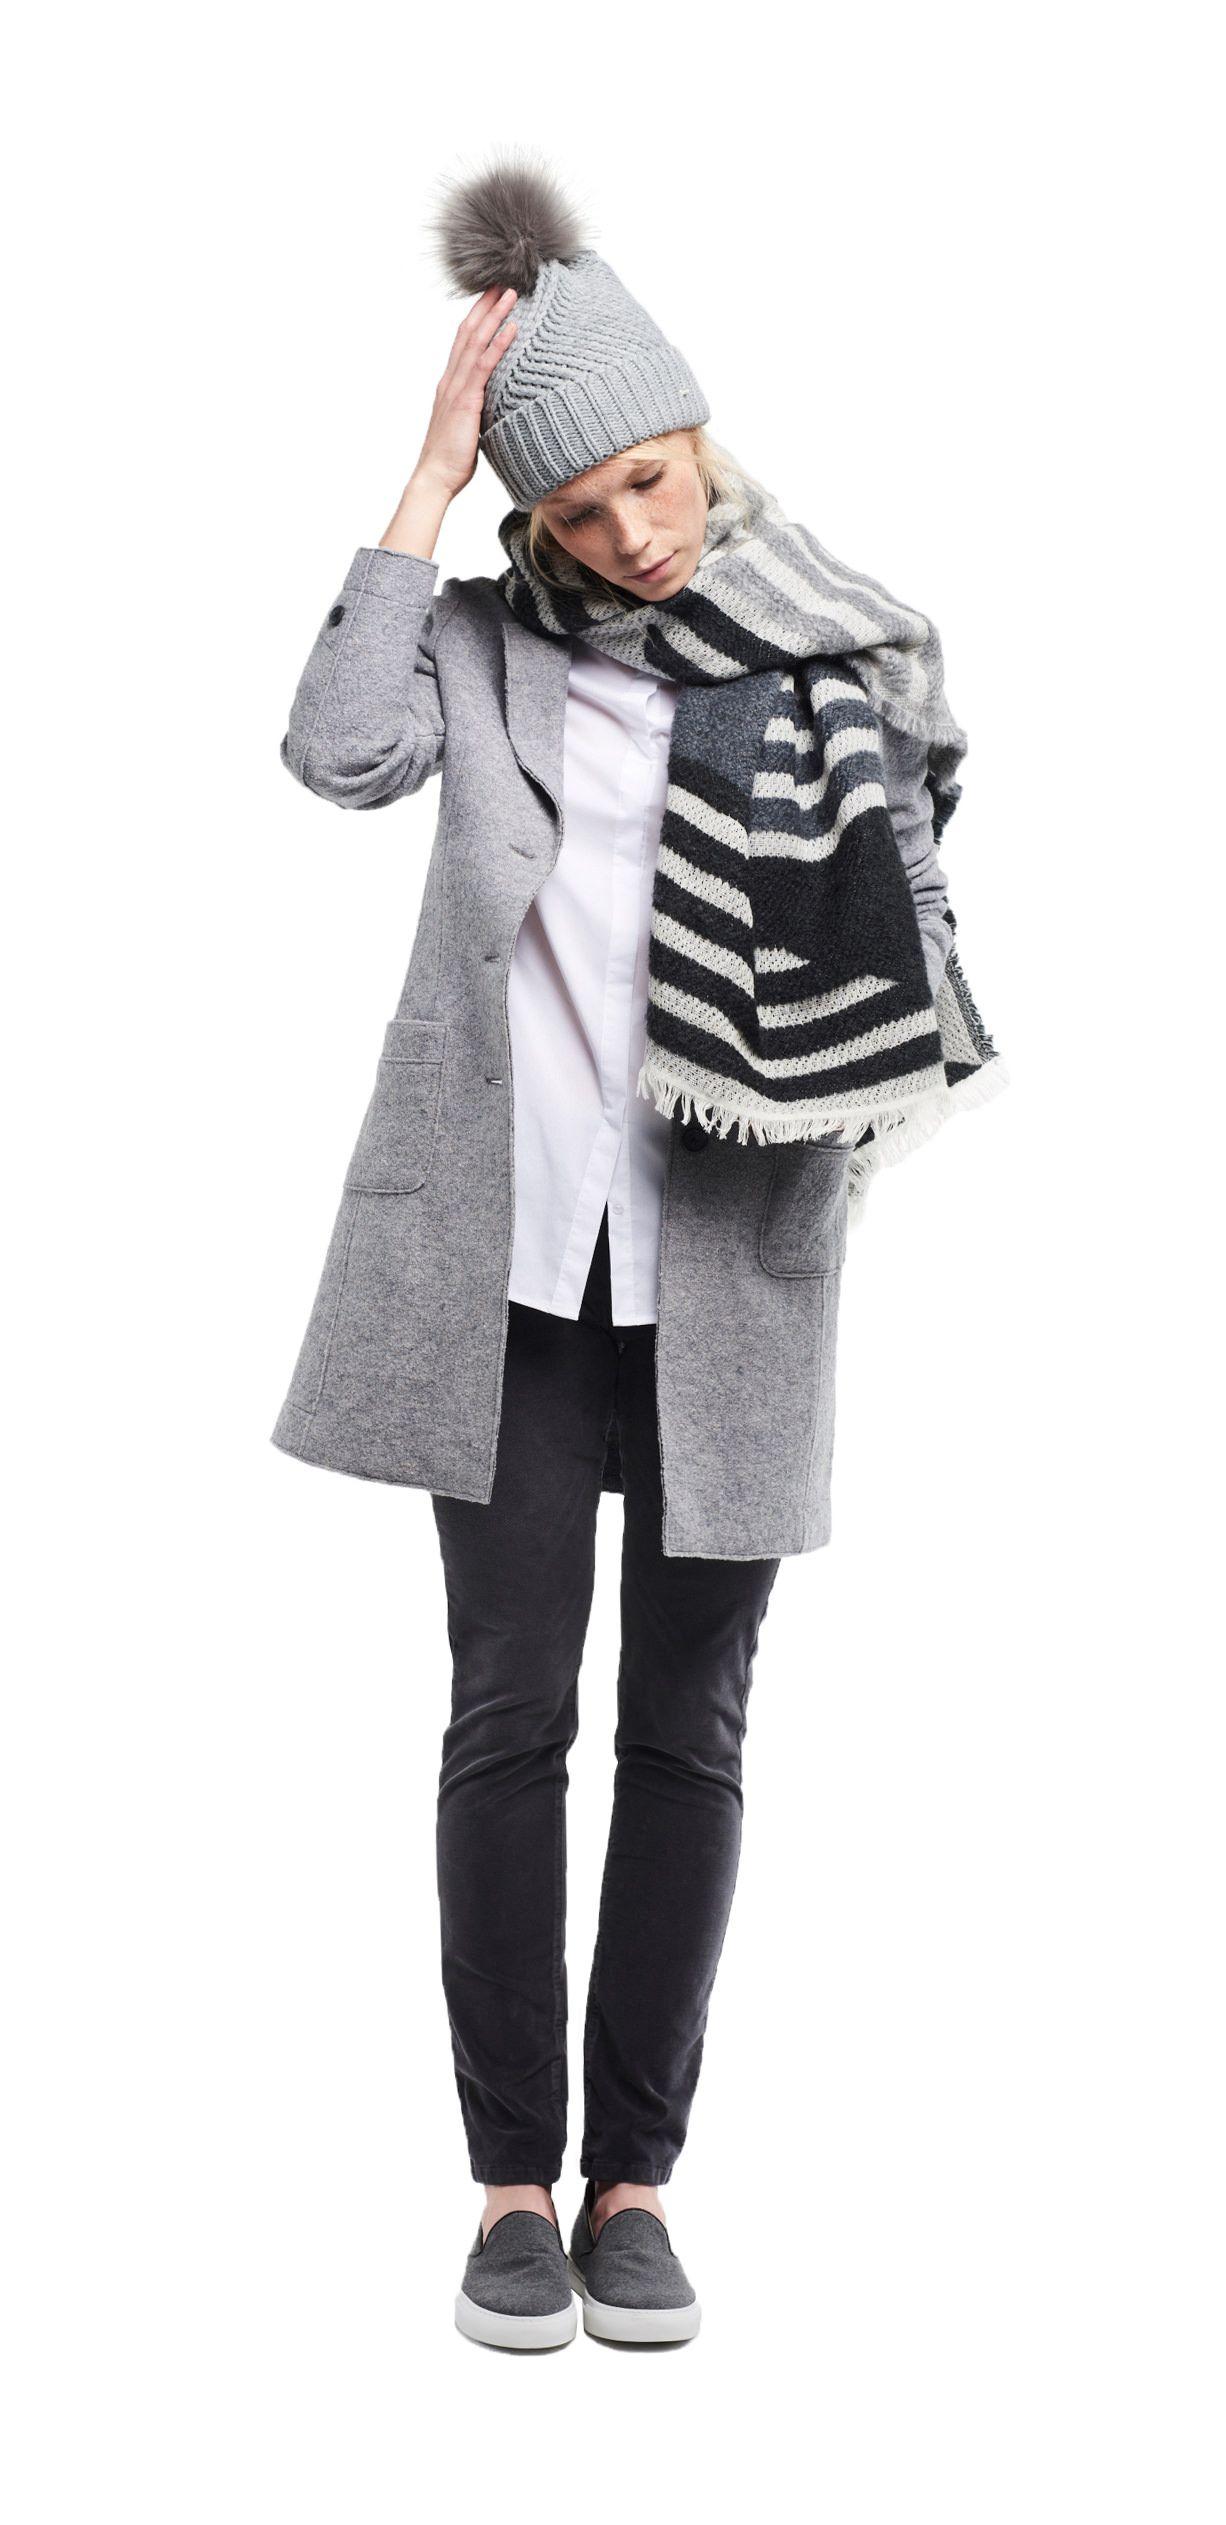 damen outfit highlight accessoires von opus fashion graue m tze grauer schal wei e bluse. Black Bedroom Furniture Sets. Home Design Ideas